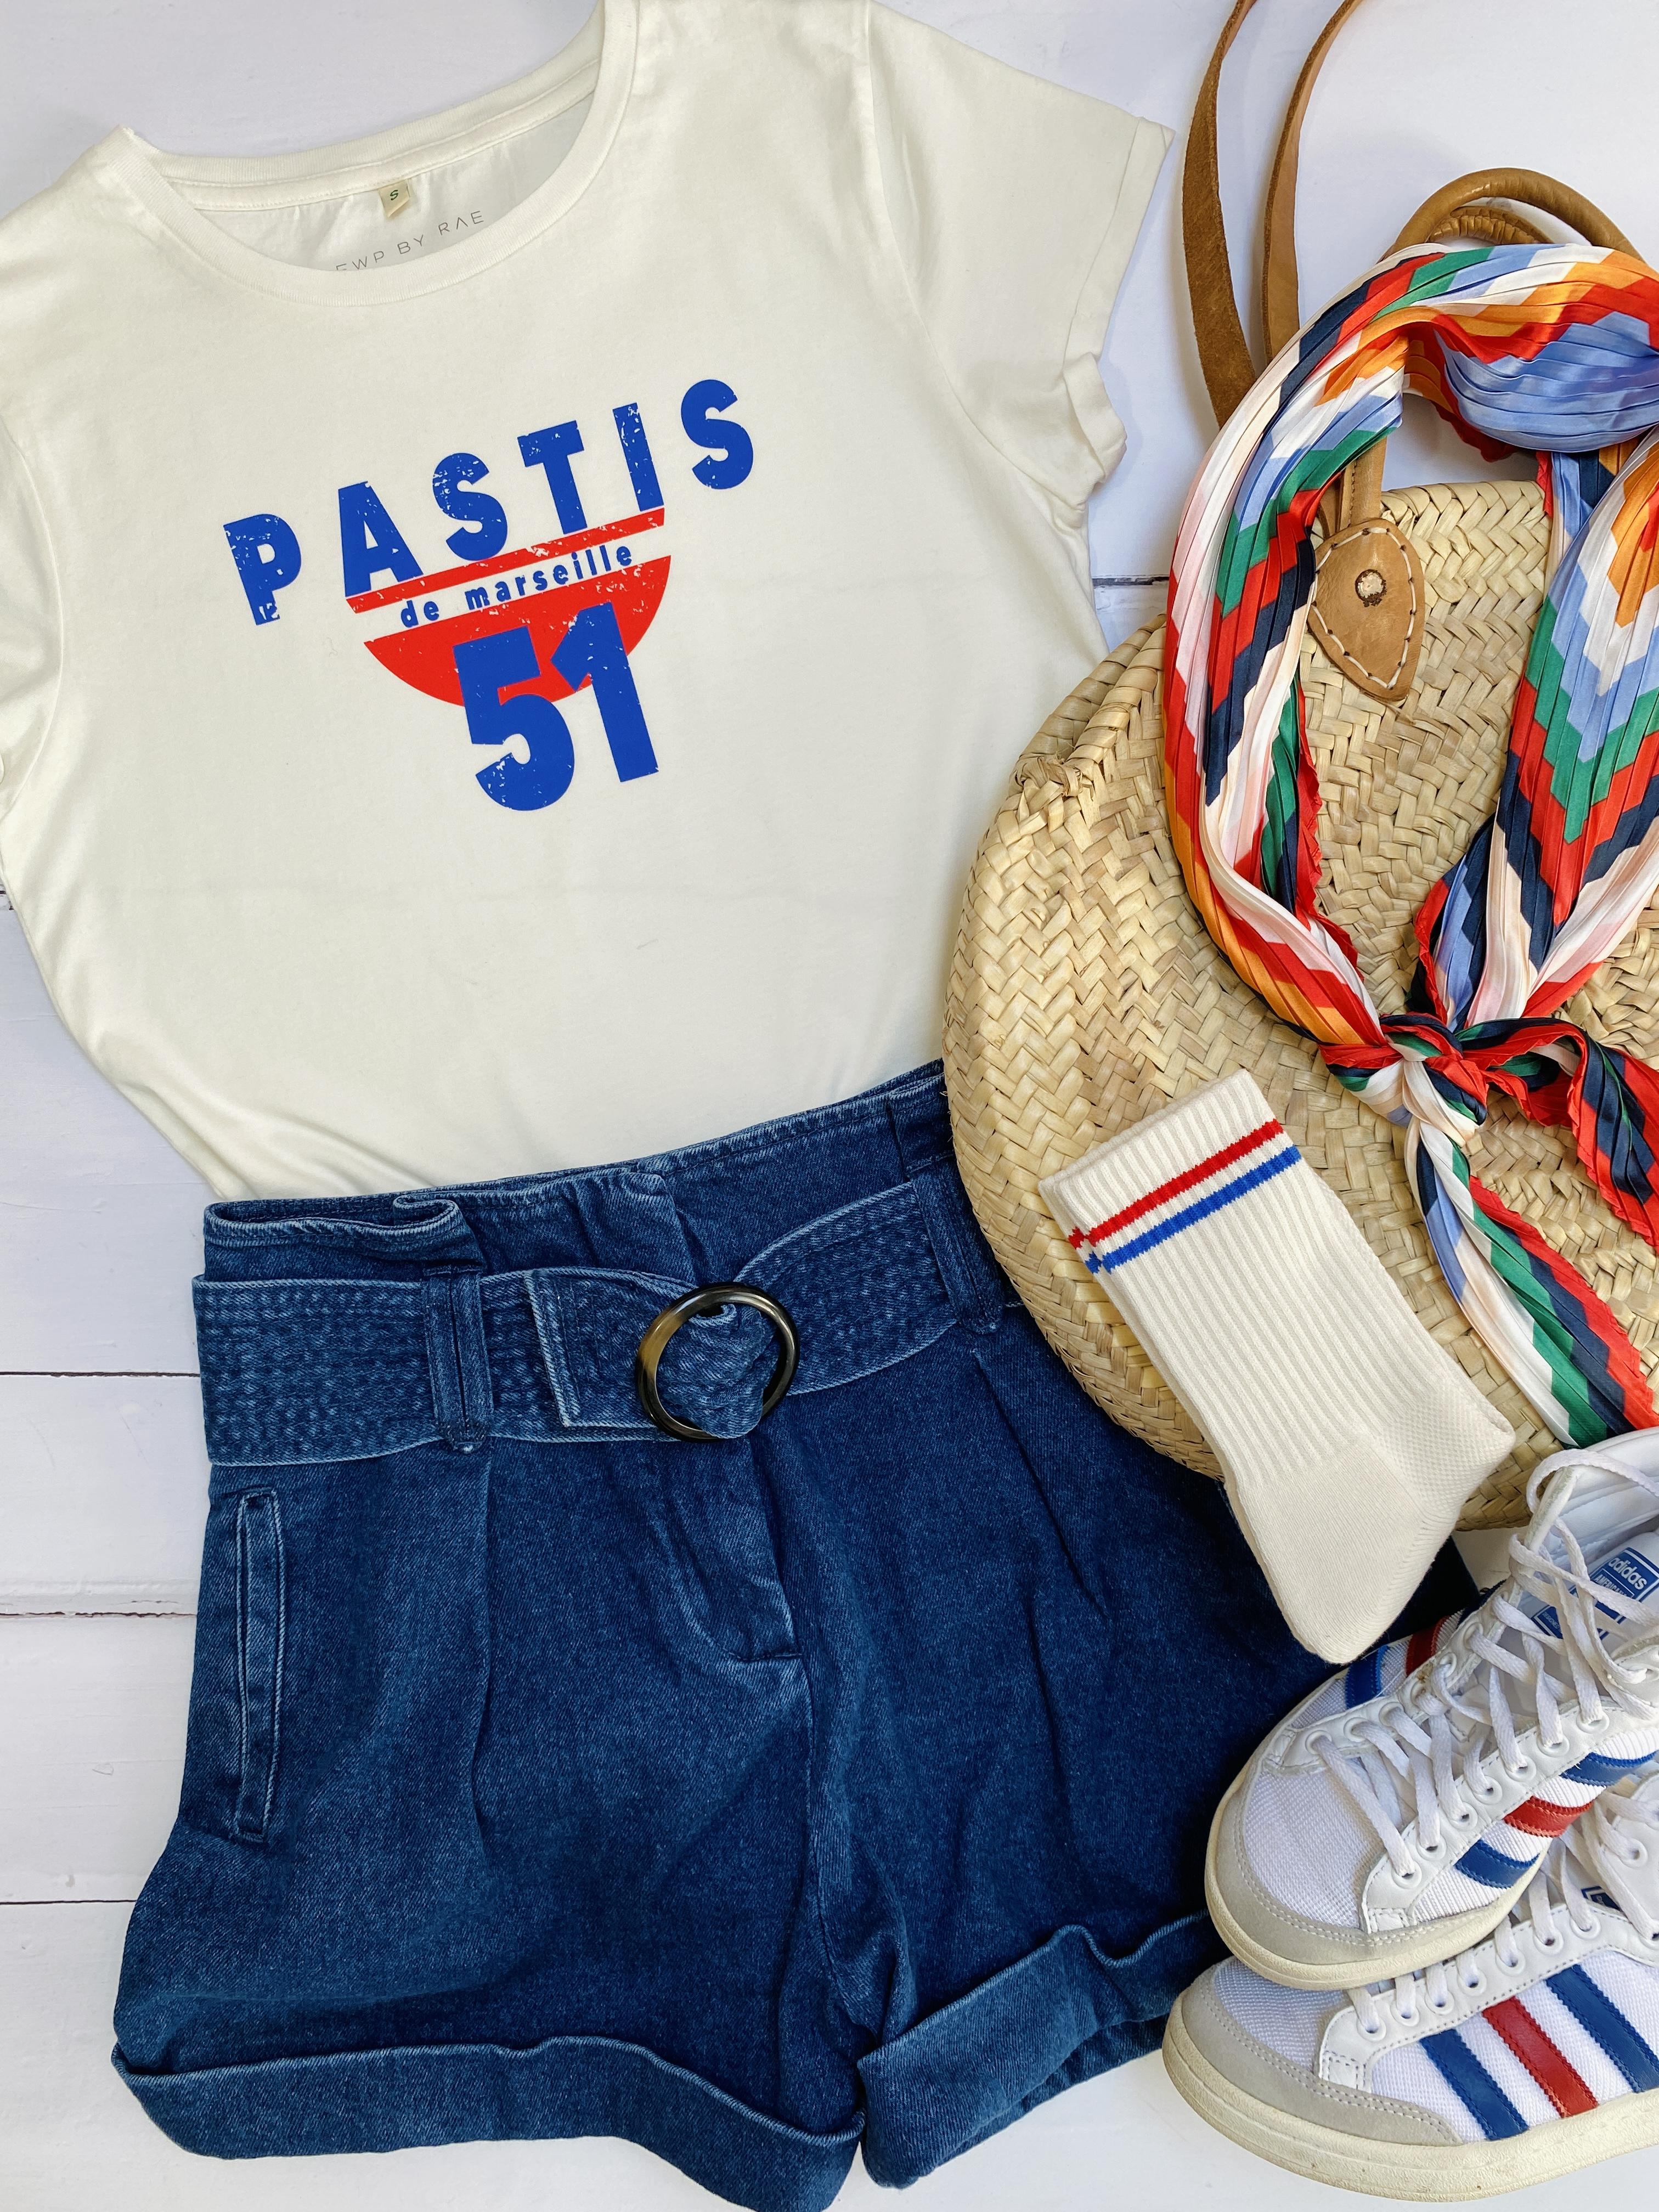 pastis 51 t-shirt